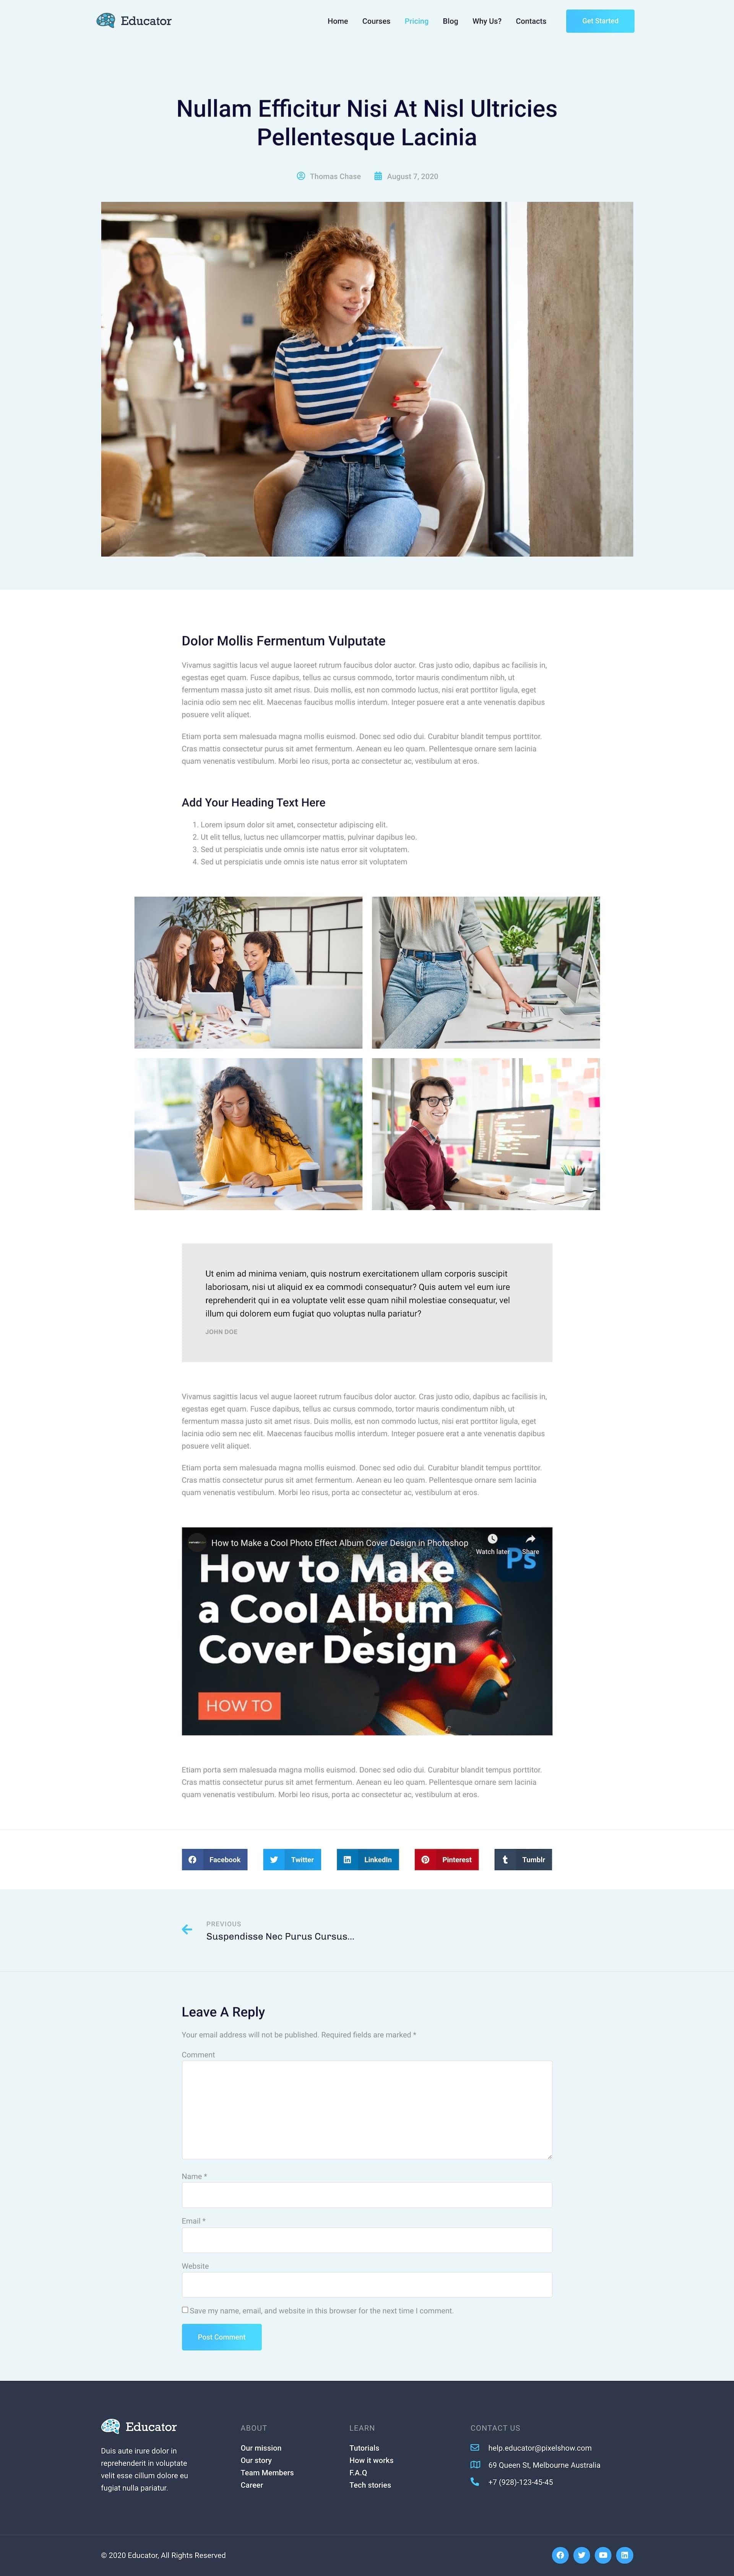 Educator Online University Courses Elementor Template Kit By Pixelshow